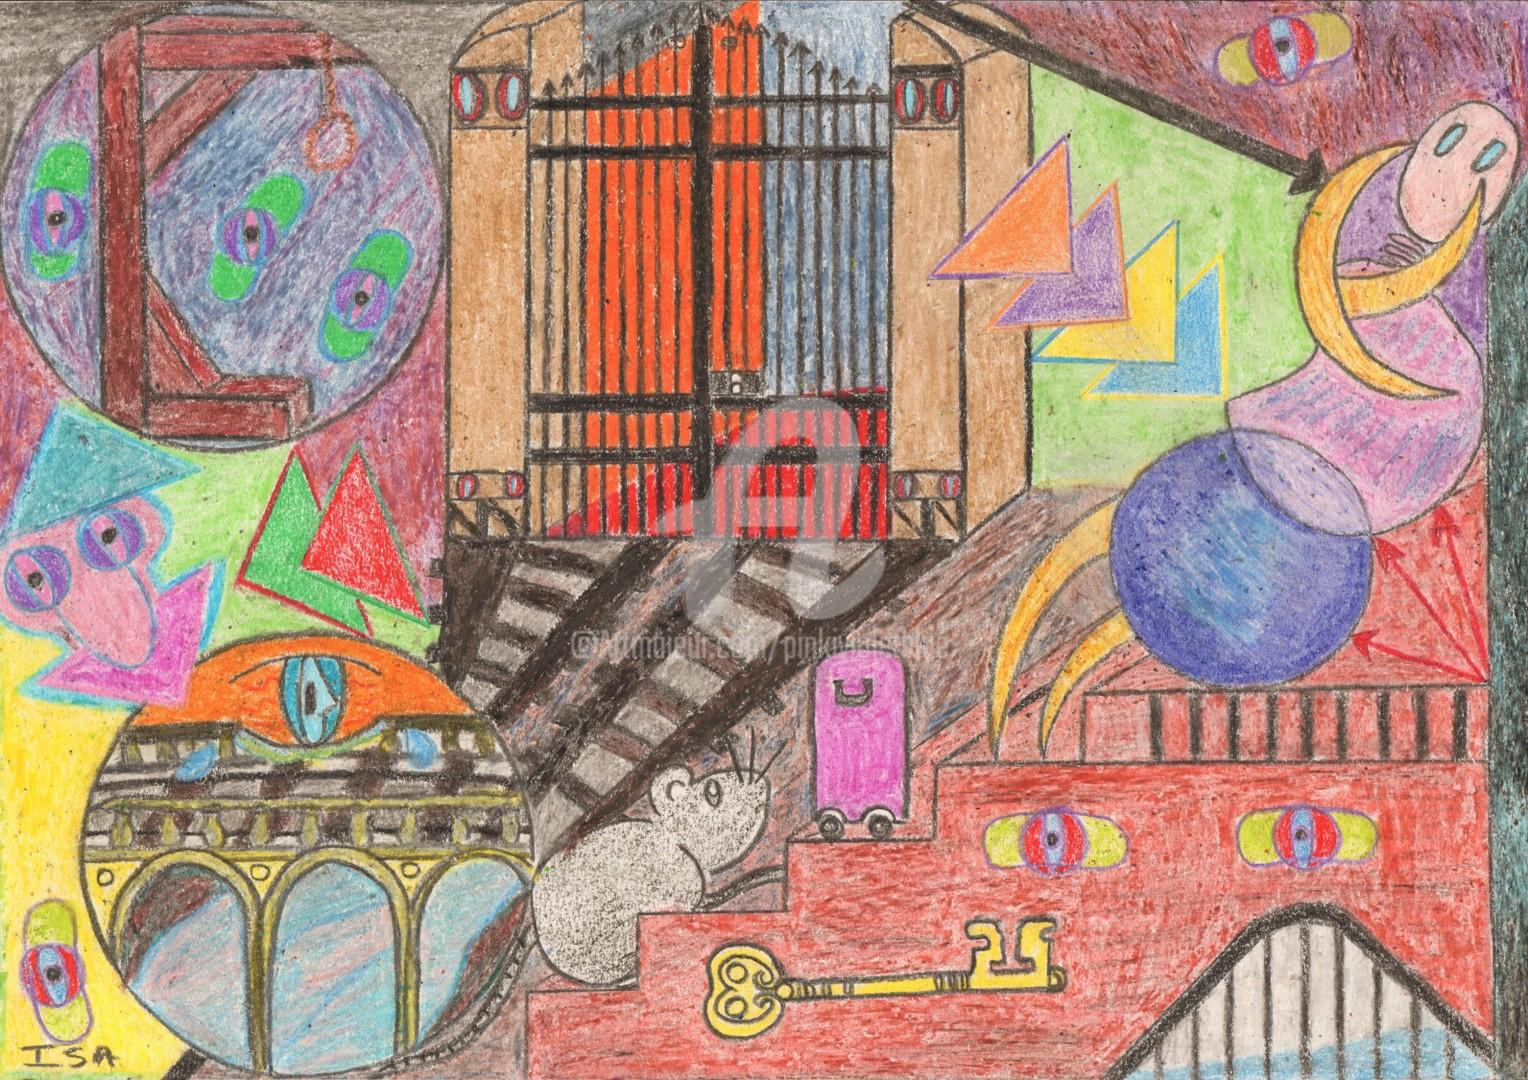 Pinkivioletblue - Abandon